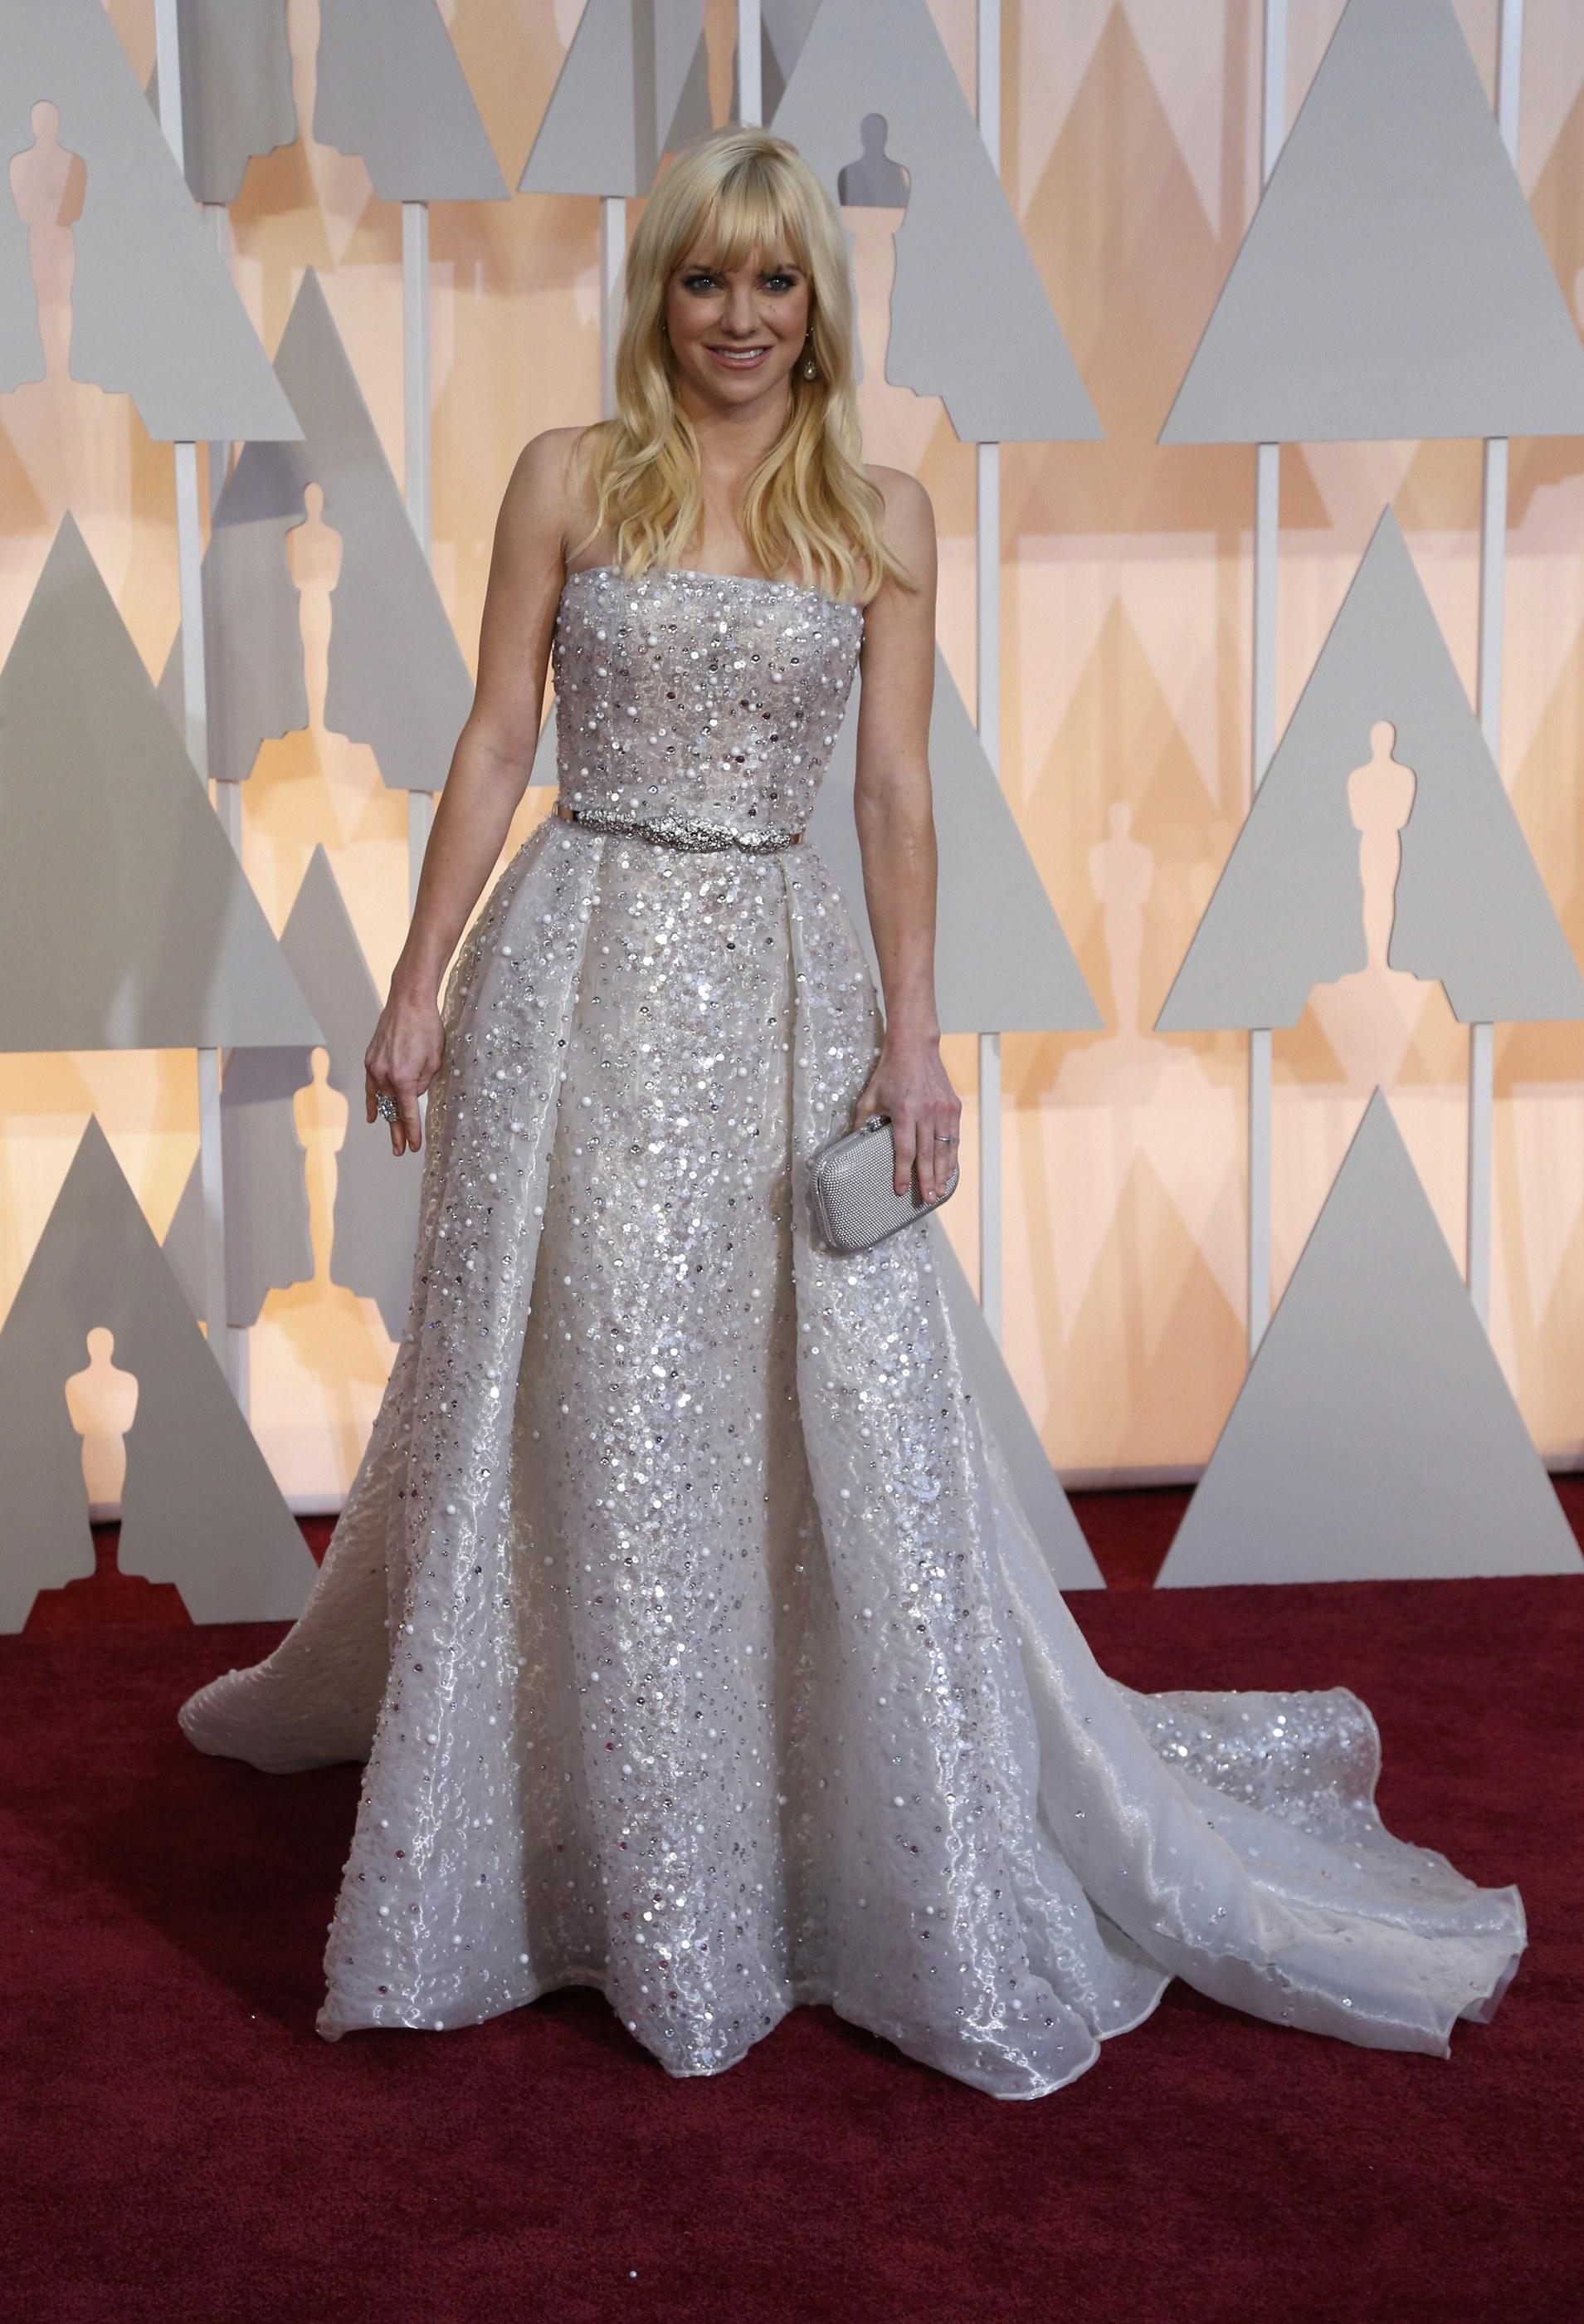 Lebanese Designer Gowns Dazzle At Oscars 2015 Bnl